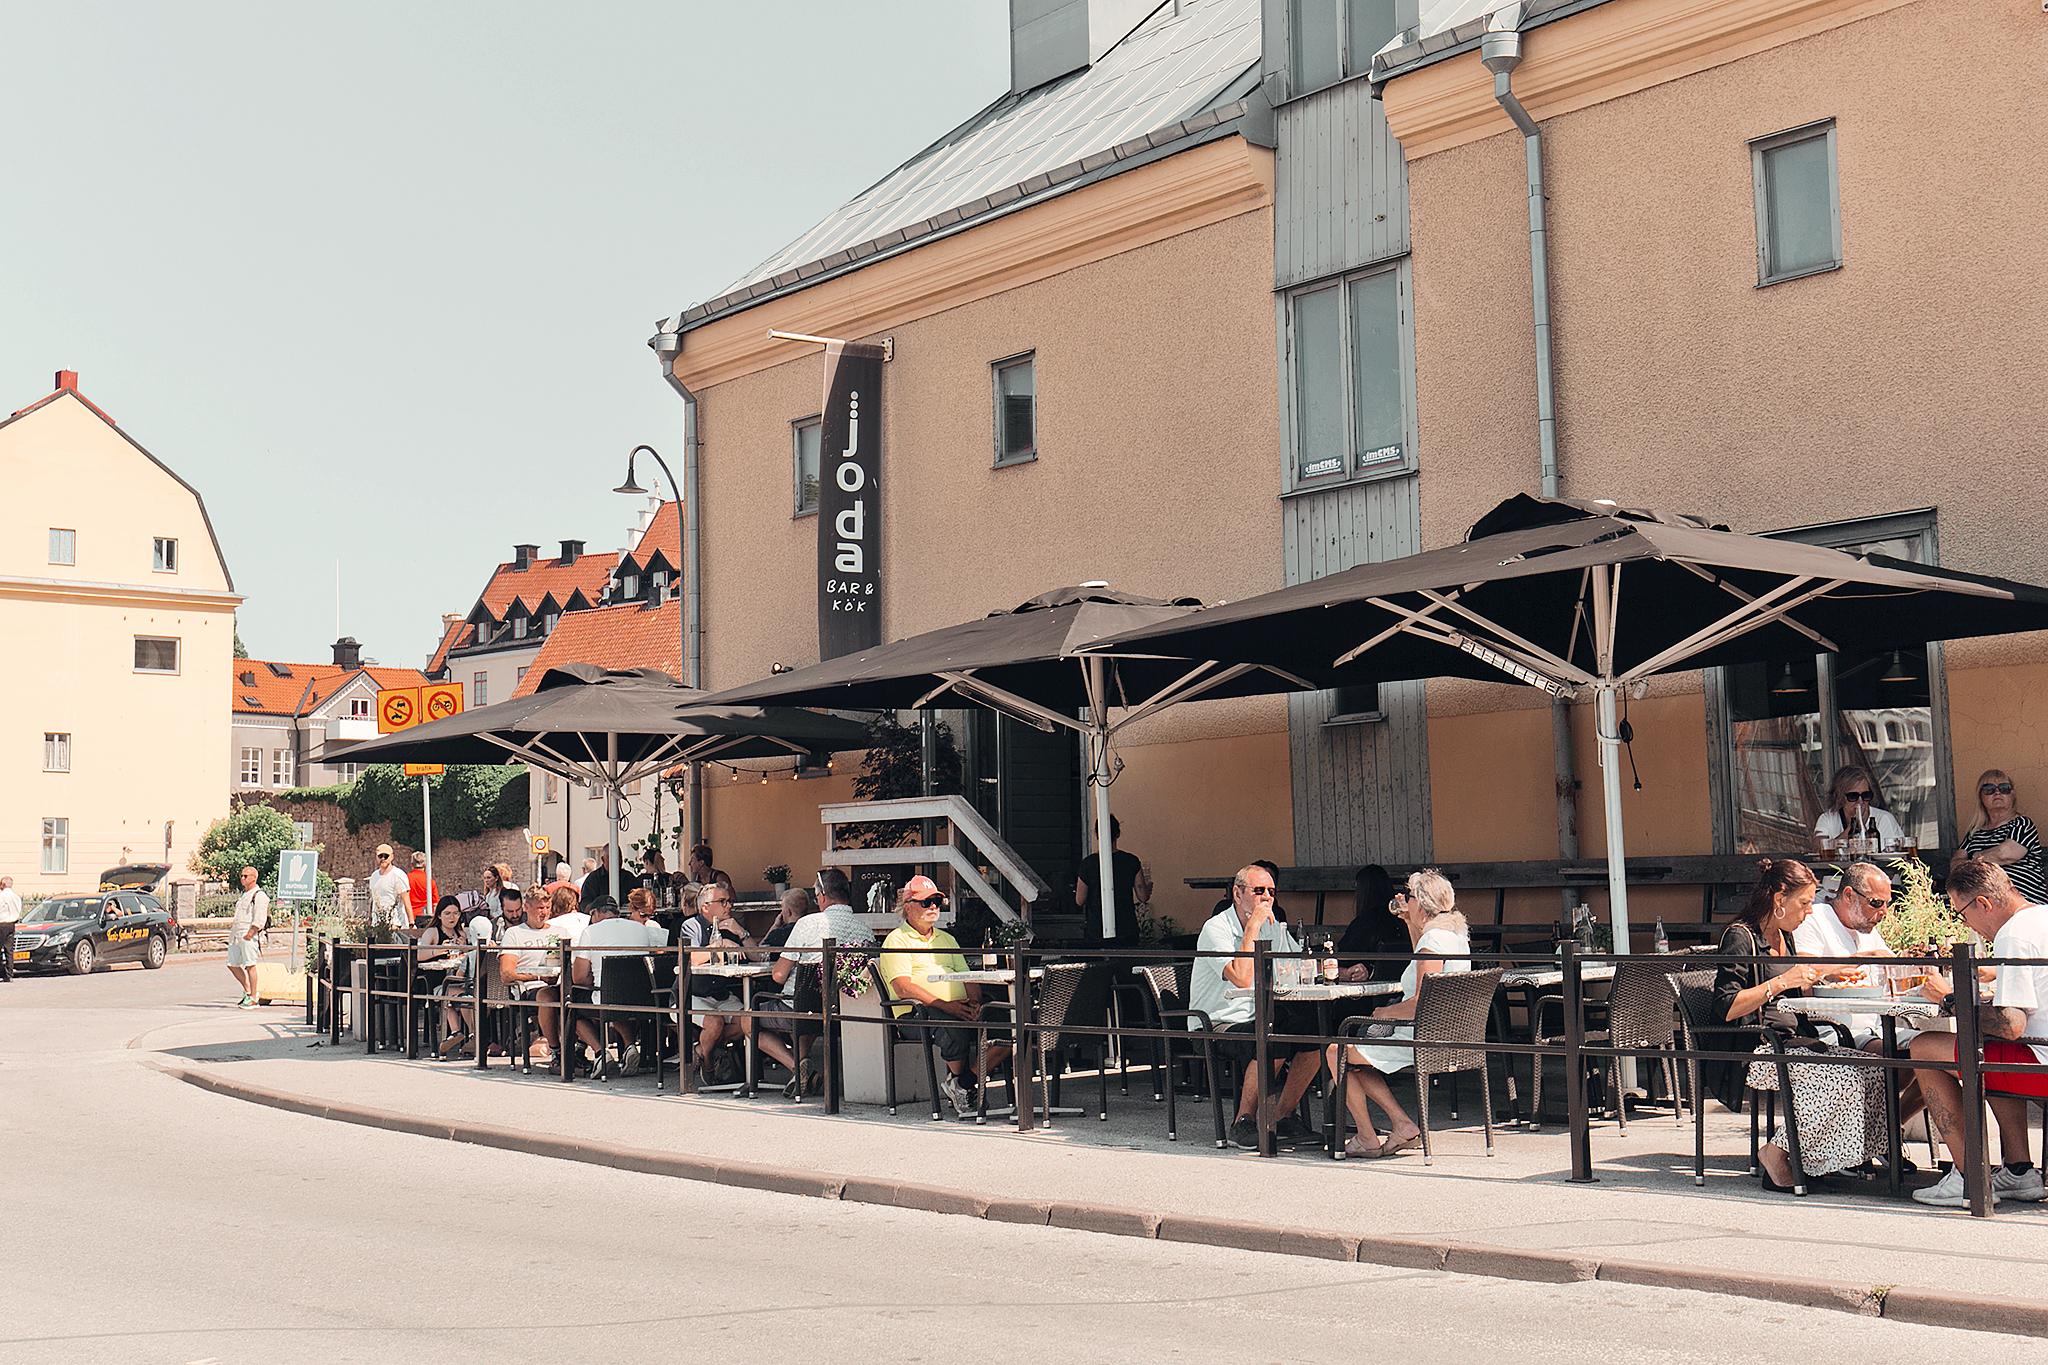 Resedagbok Gotland: Joda